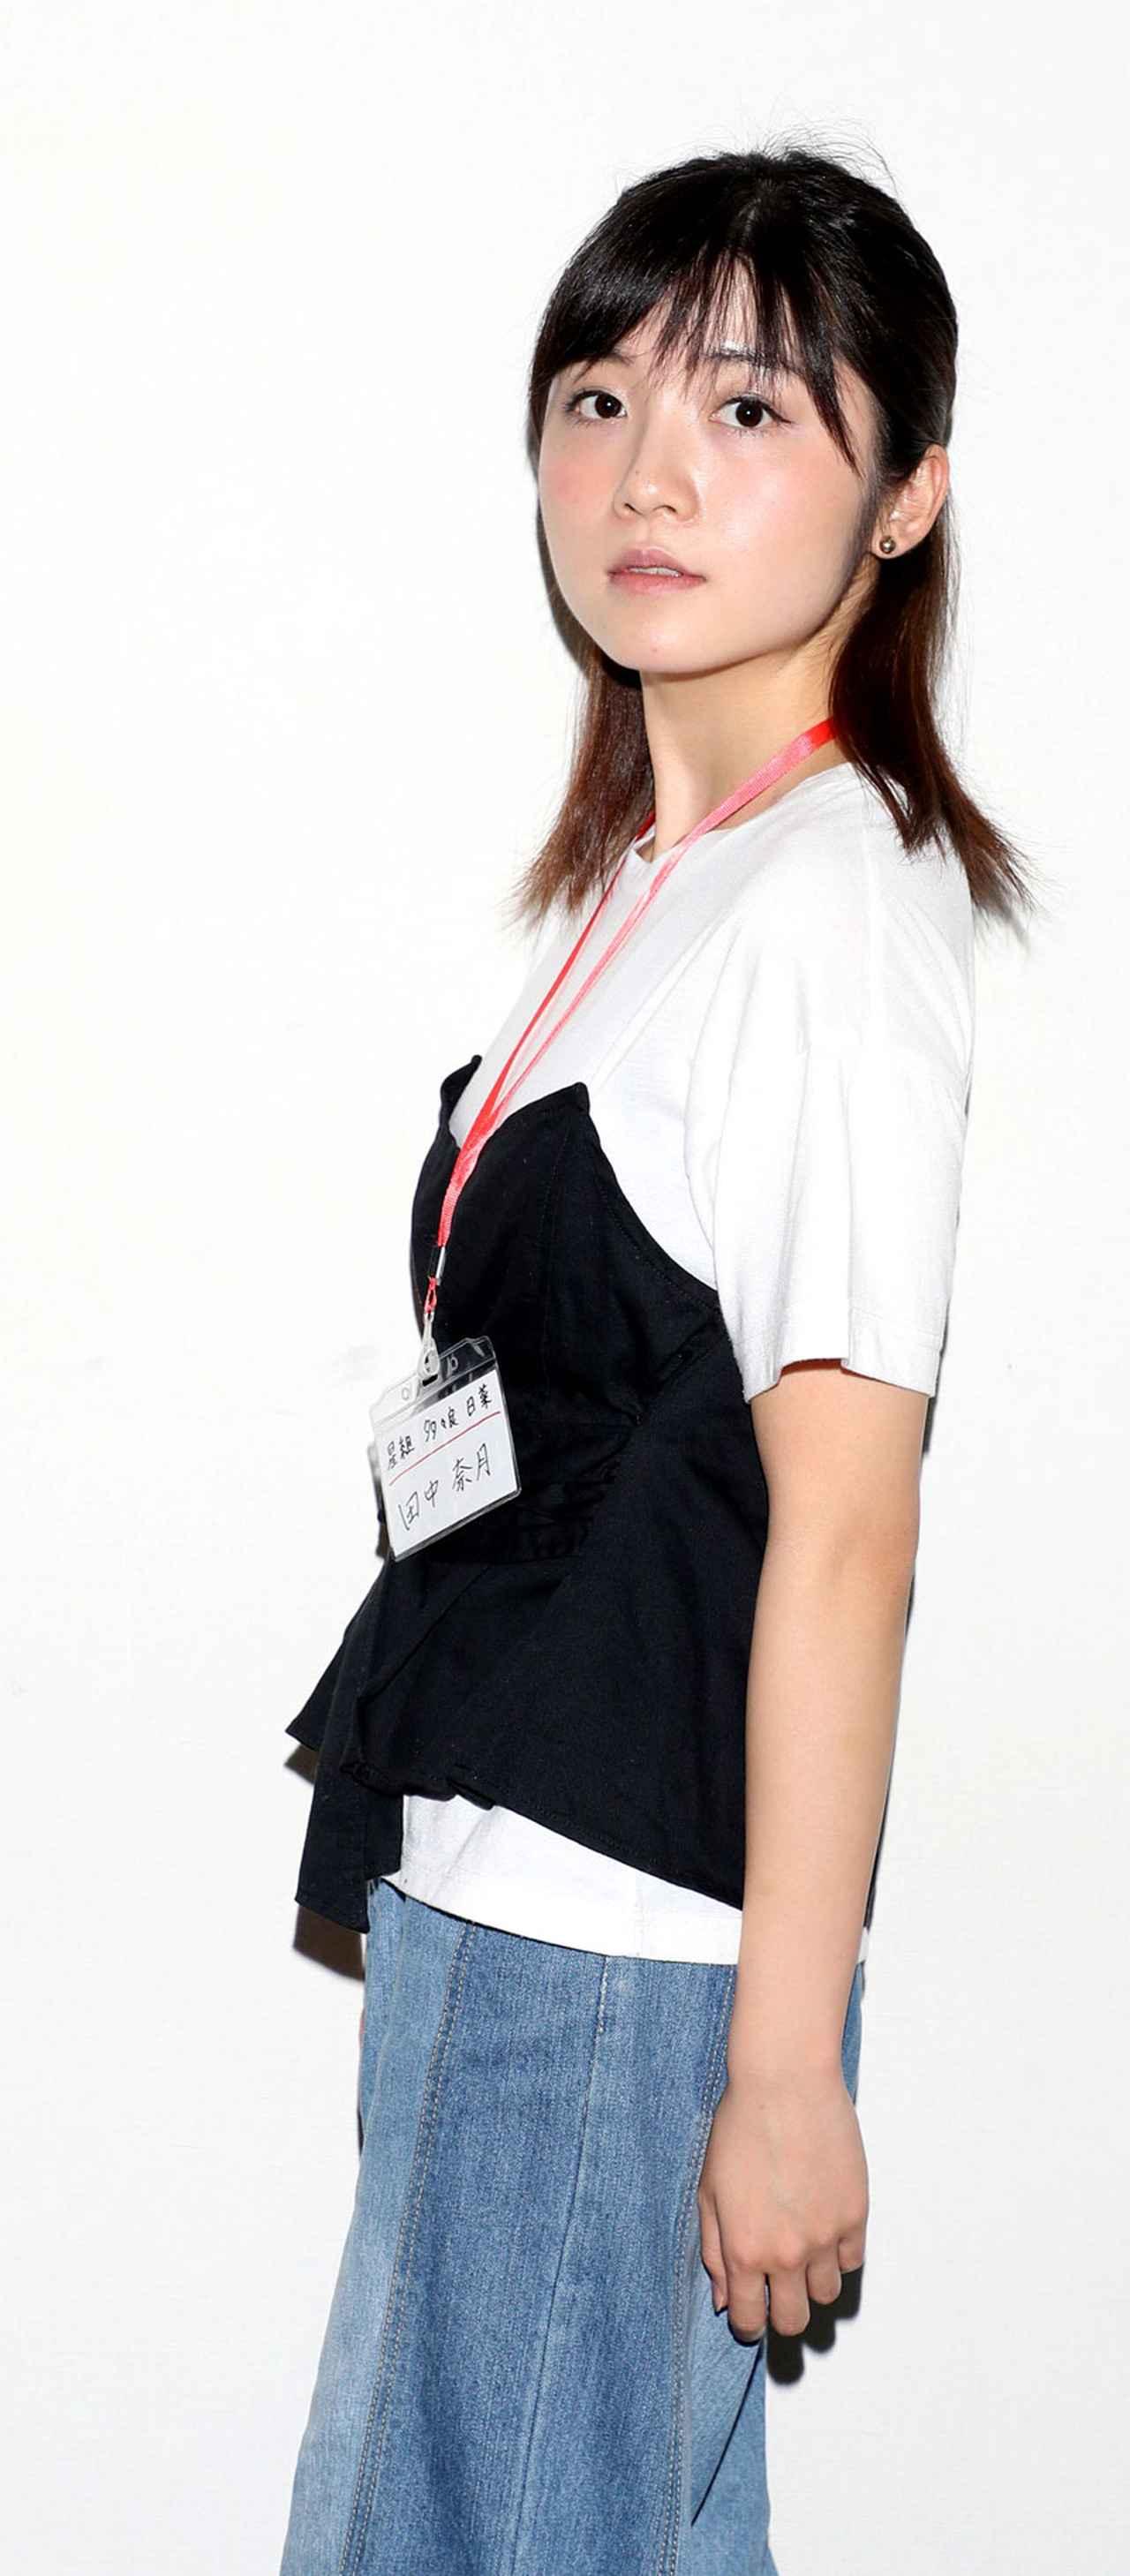 Images : 10番目の画像 - 「田中奈月/将来有望な若手女優の中でも大注目の一人が、アリスインプロジェクト最新作で印象に残る役を熱演!」のアルバム - Stereo Sound ONLINE